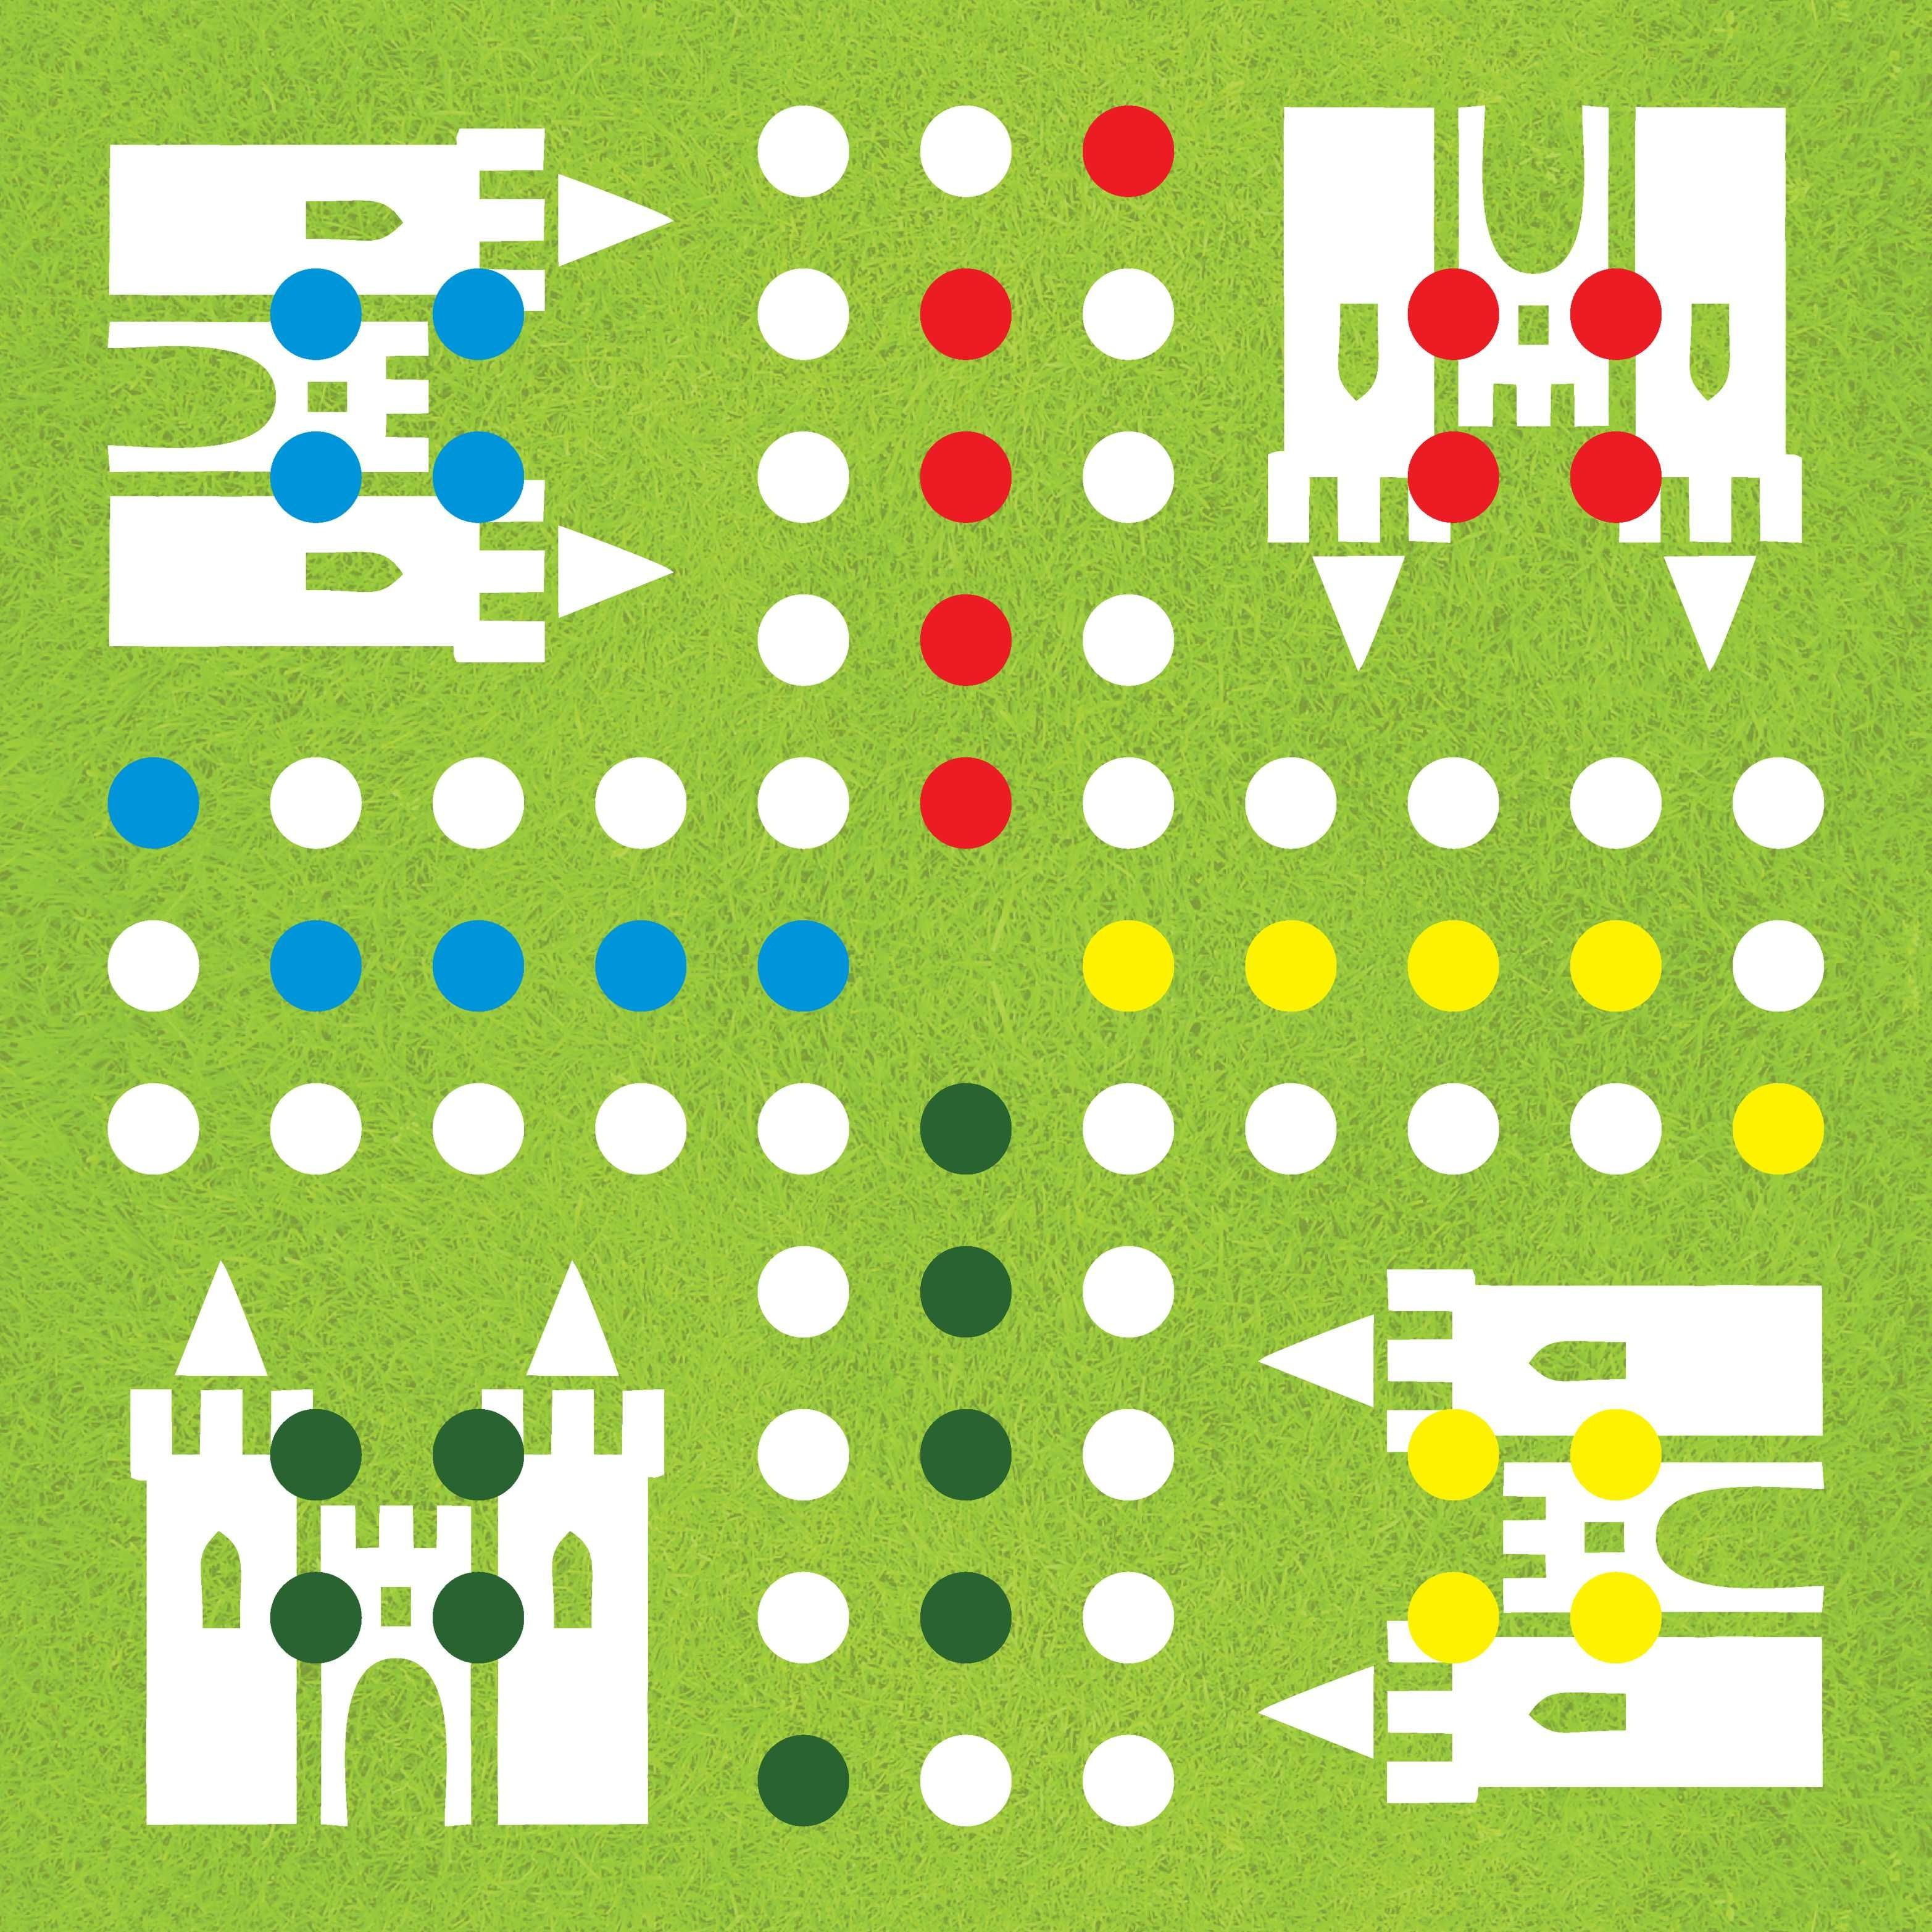 Diy-Ludo-Board-Game-Template -   Board Game   Társasjátékok, Játék - Free Printable Ludo Board